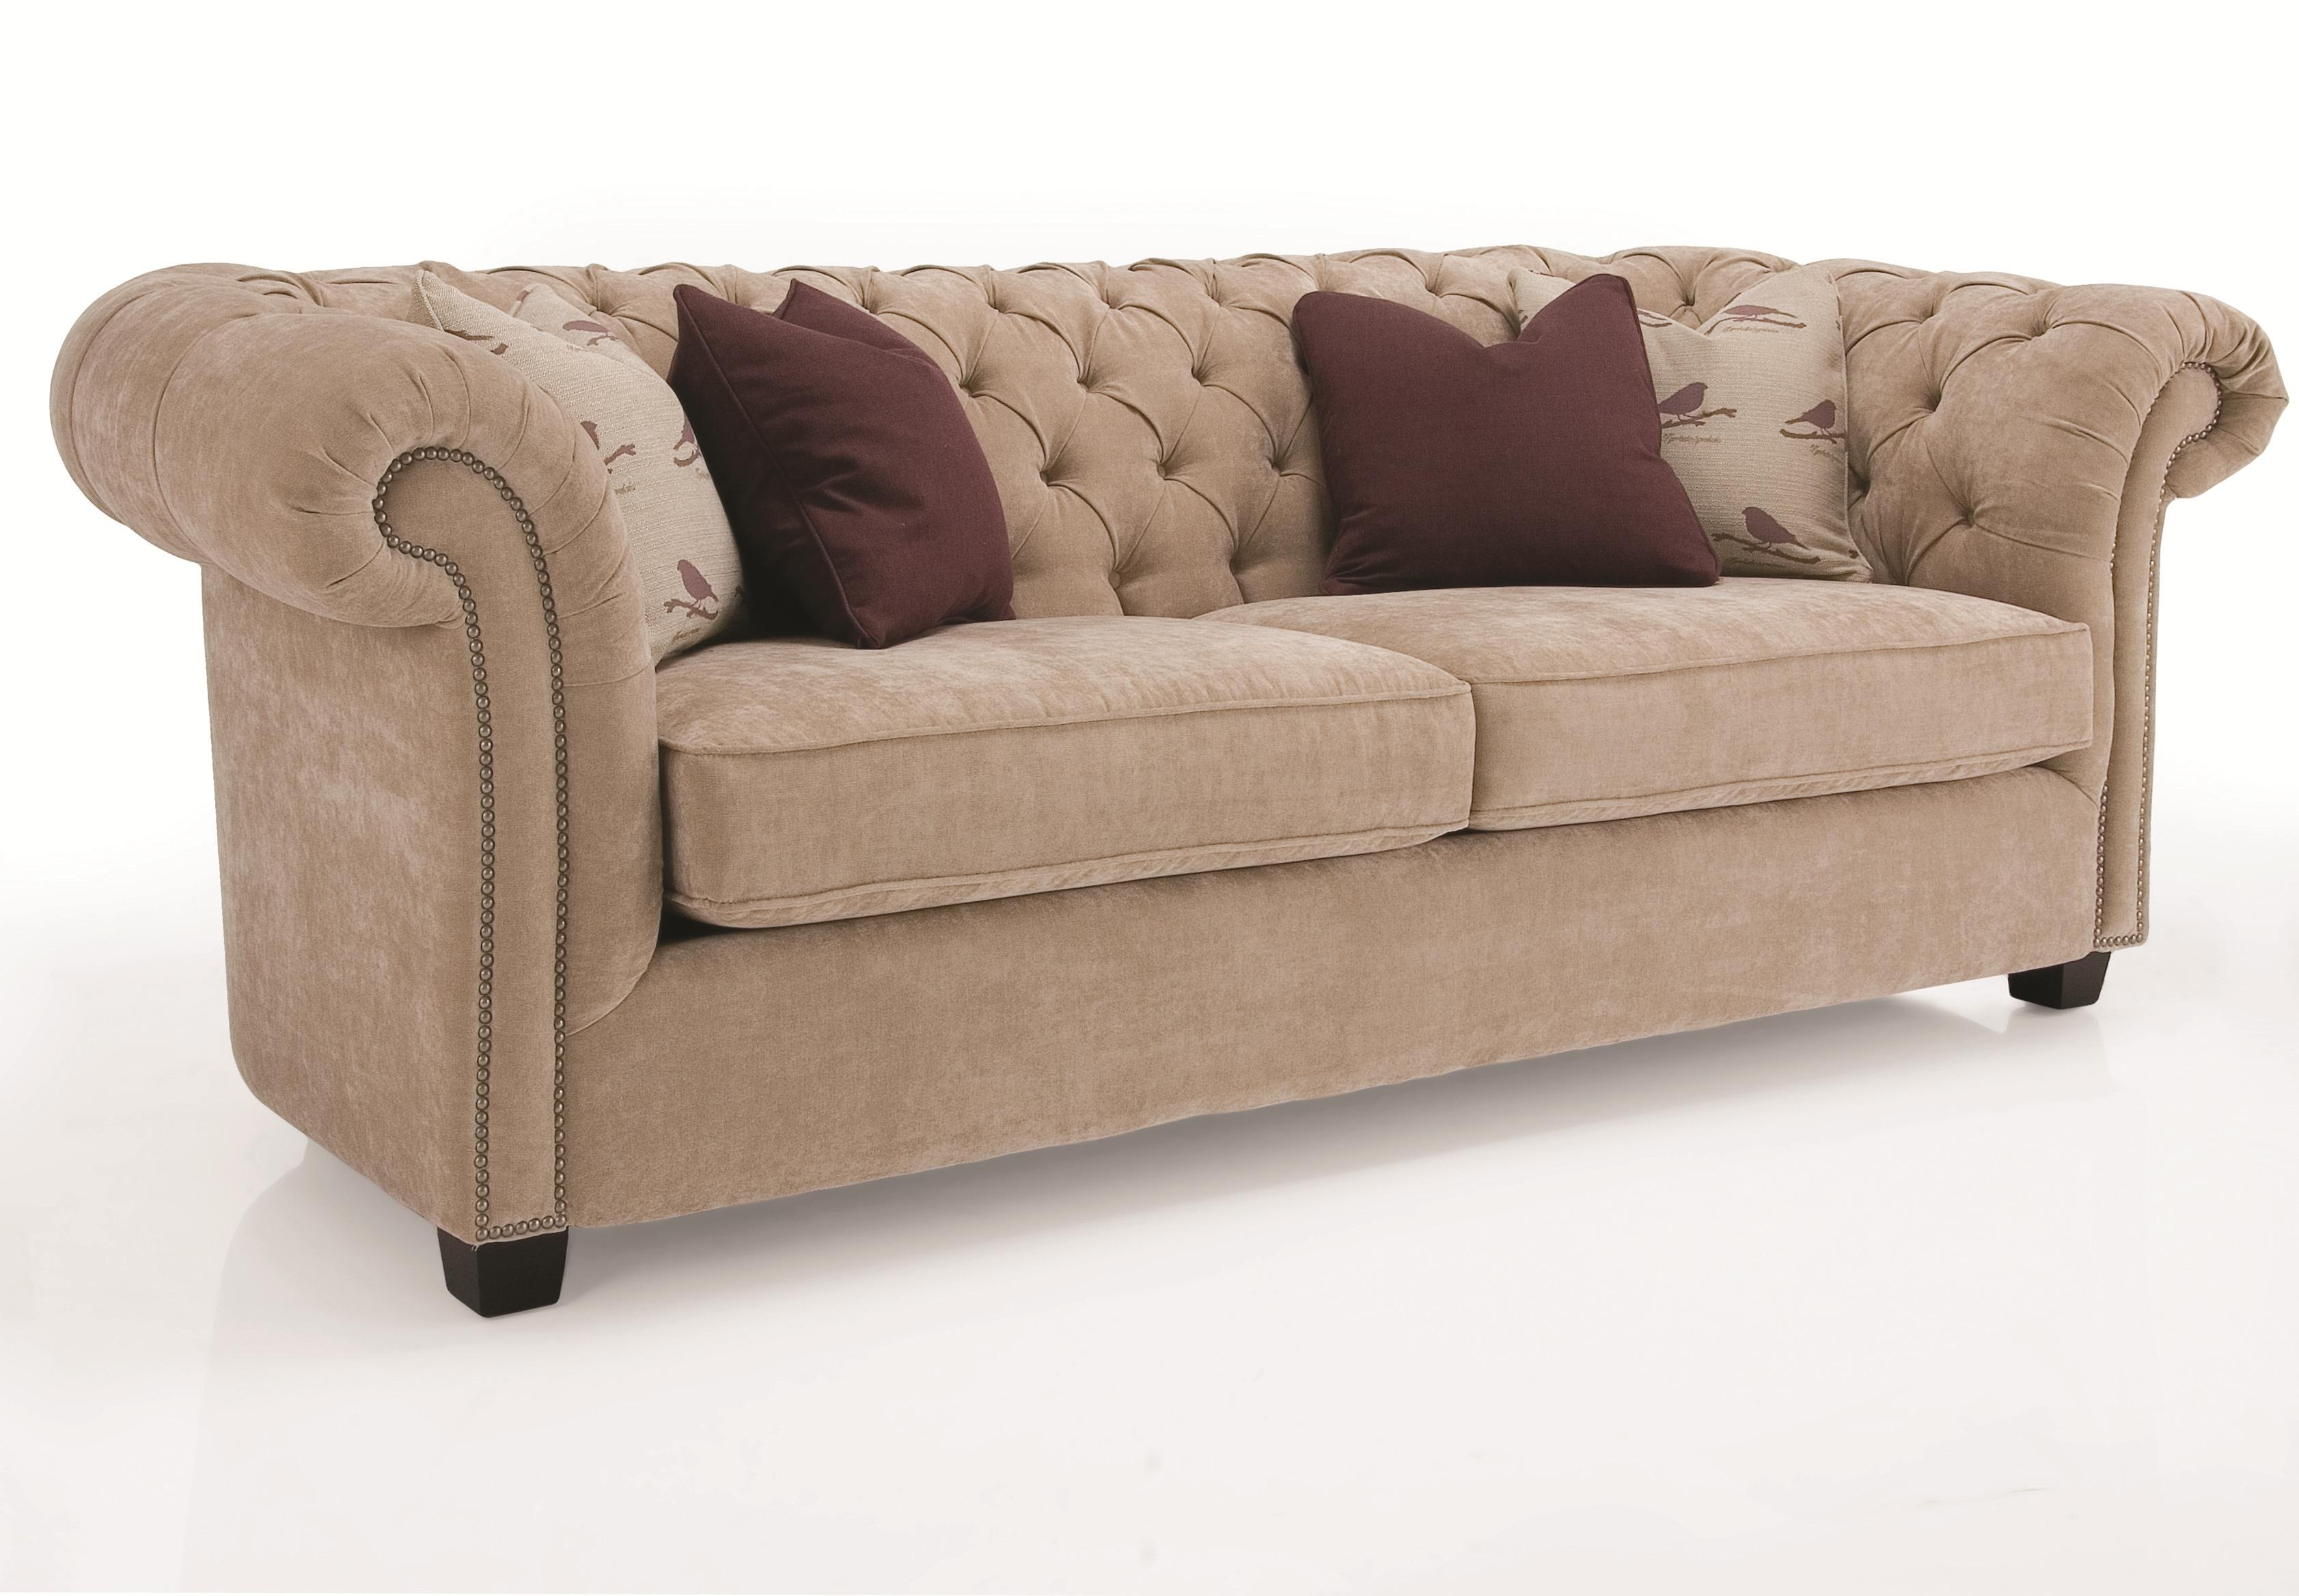 sofas hamilton ontario sofa bed uk made decor rest churchill stoney creek